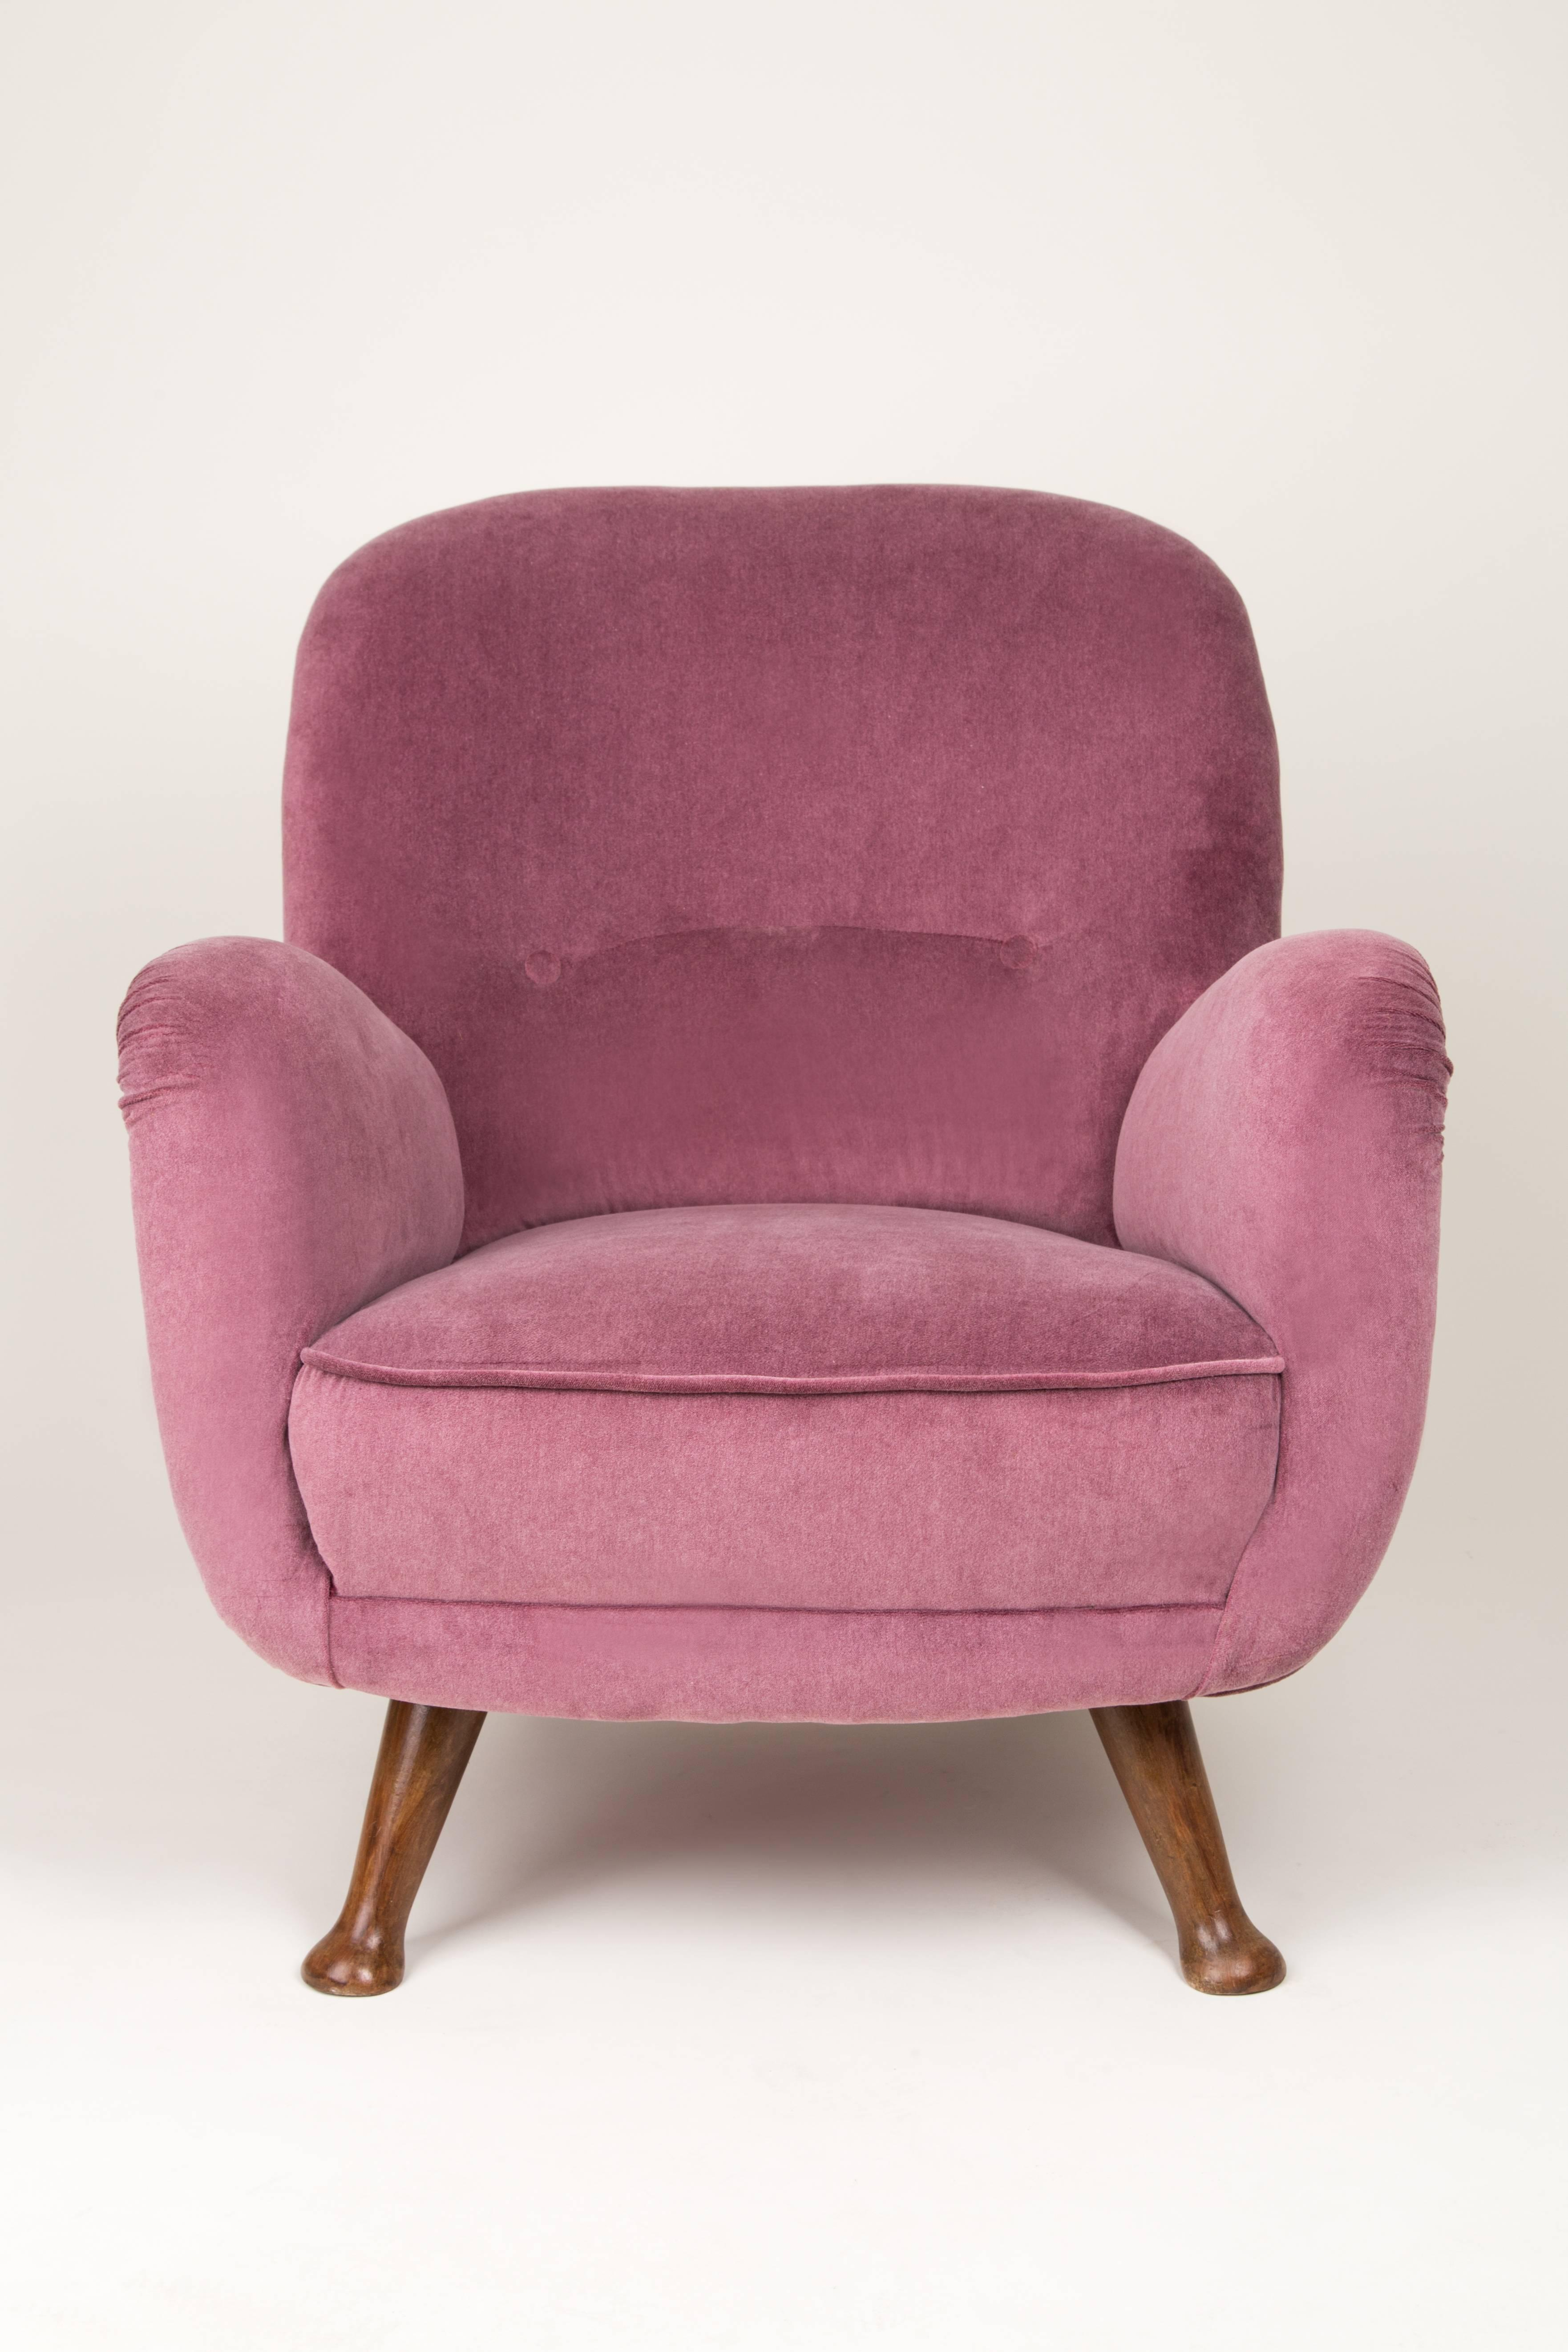 Mid-Century Modern Vintage Burgundy Big Armchair, 1960s For Sale